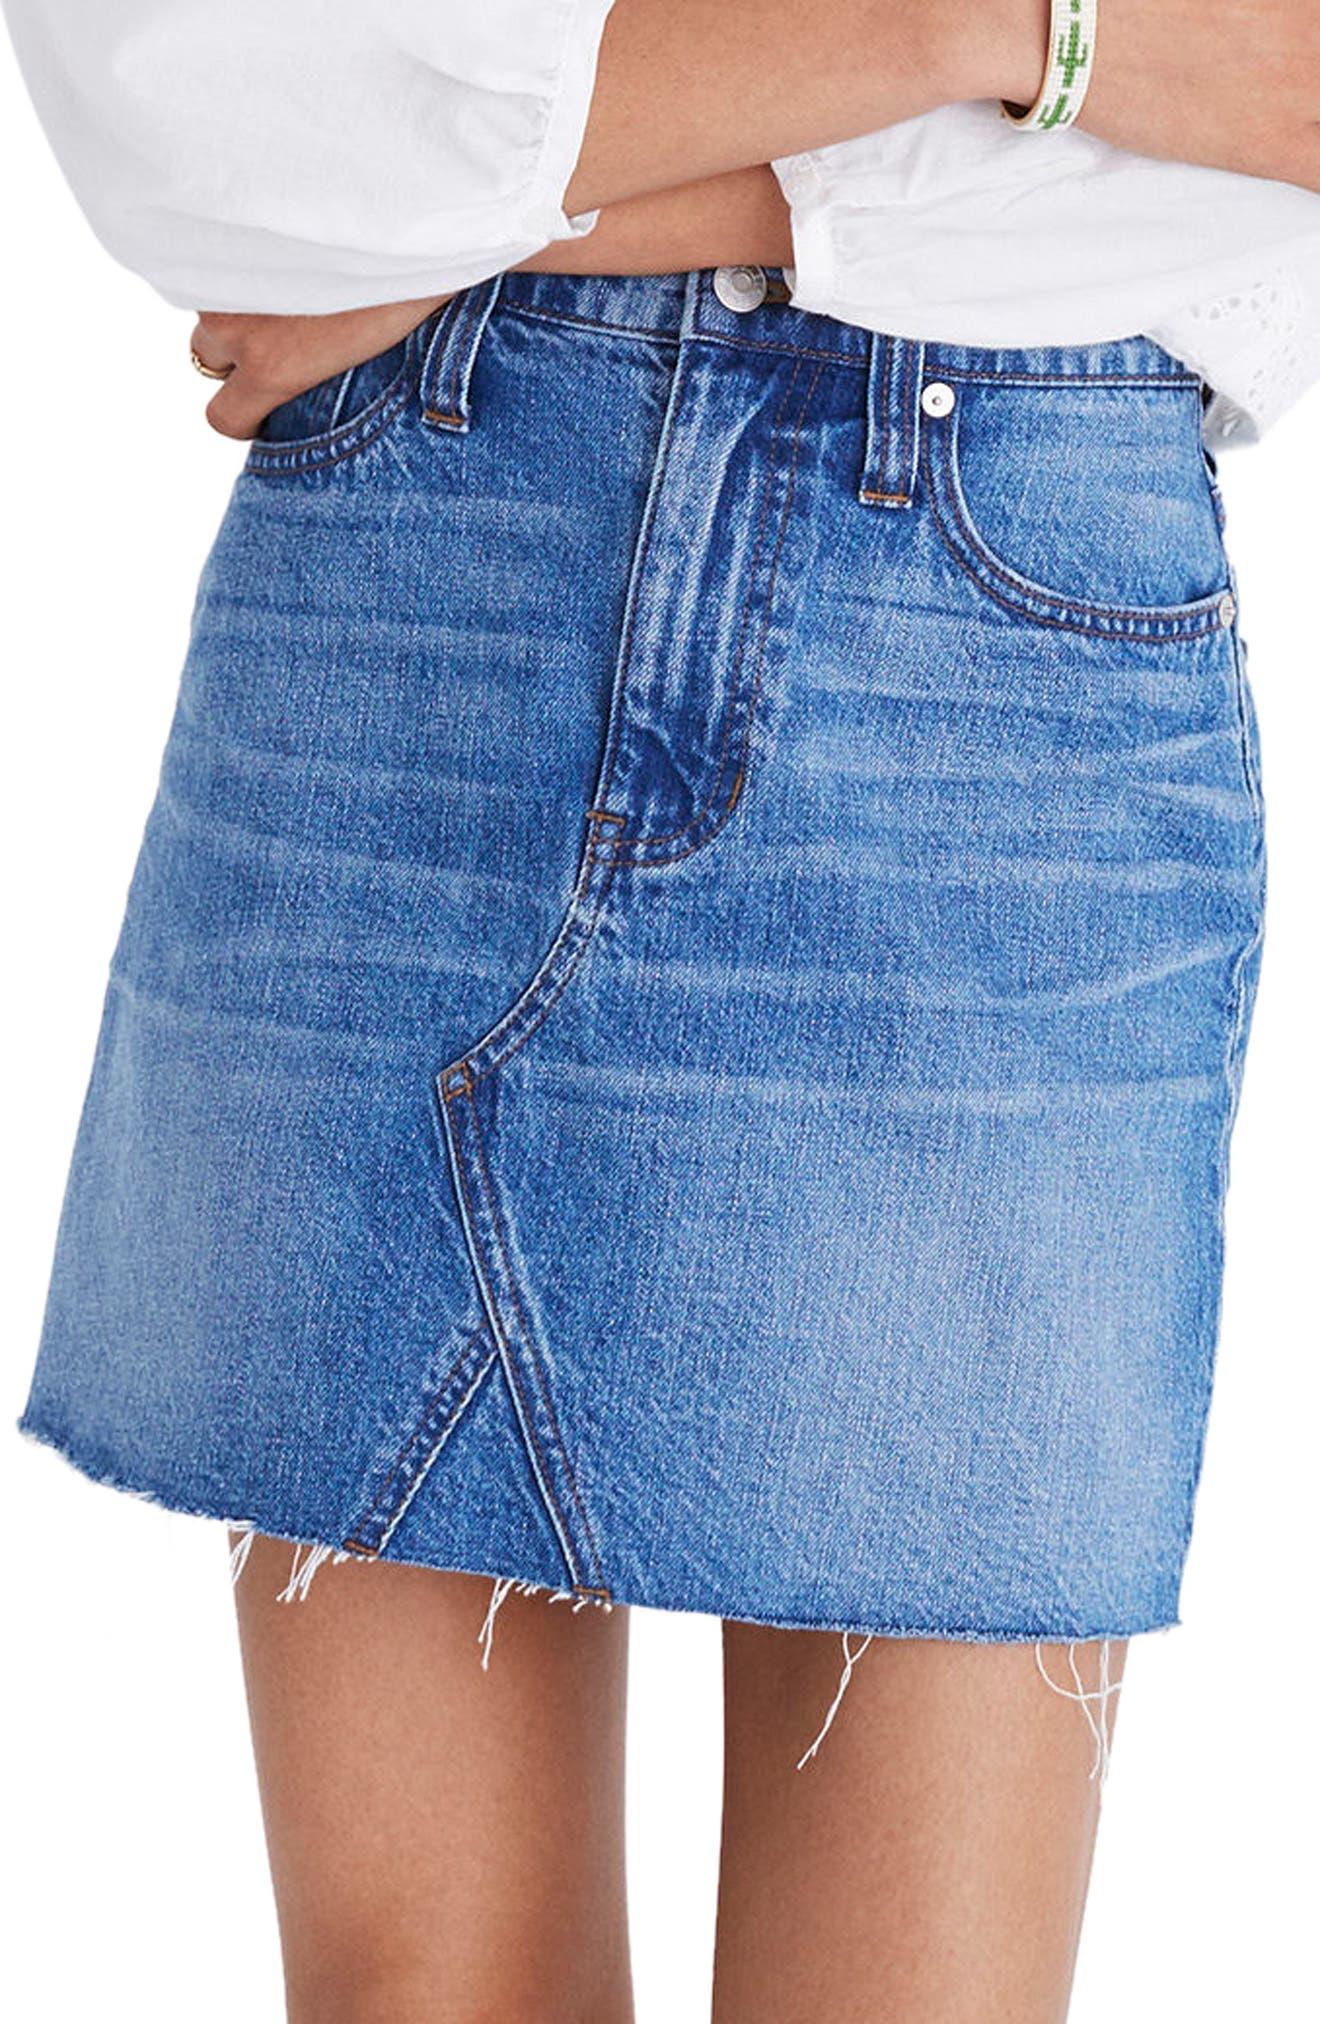 Main Image - Madewell Frisco Denim Miniskirt